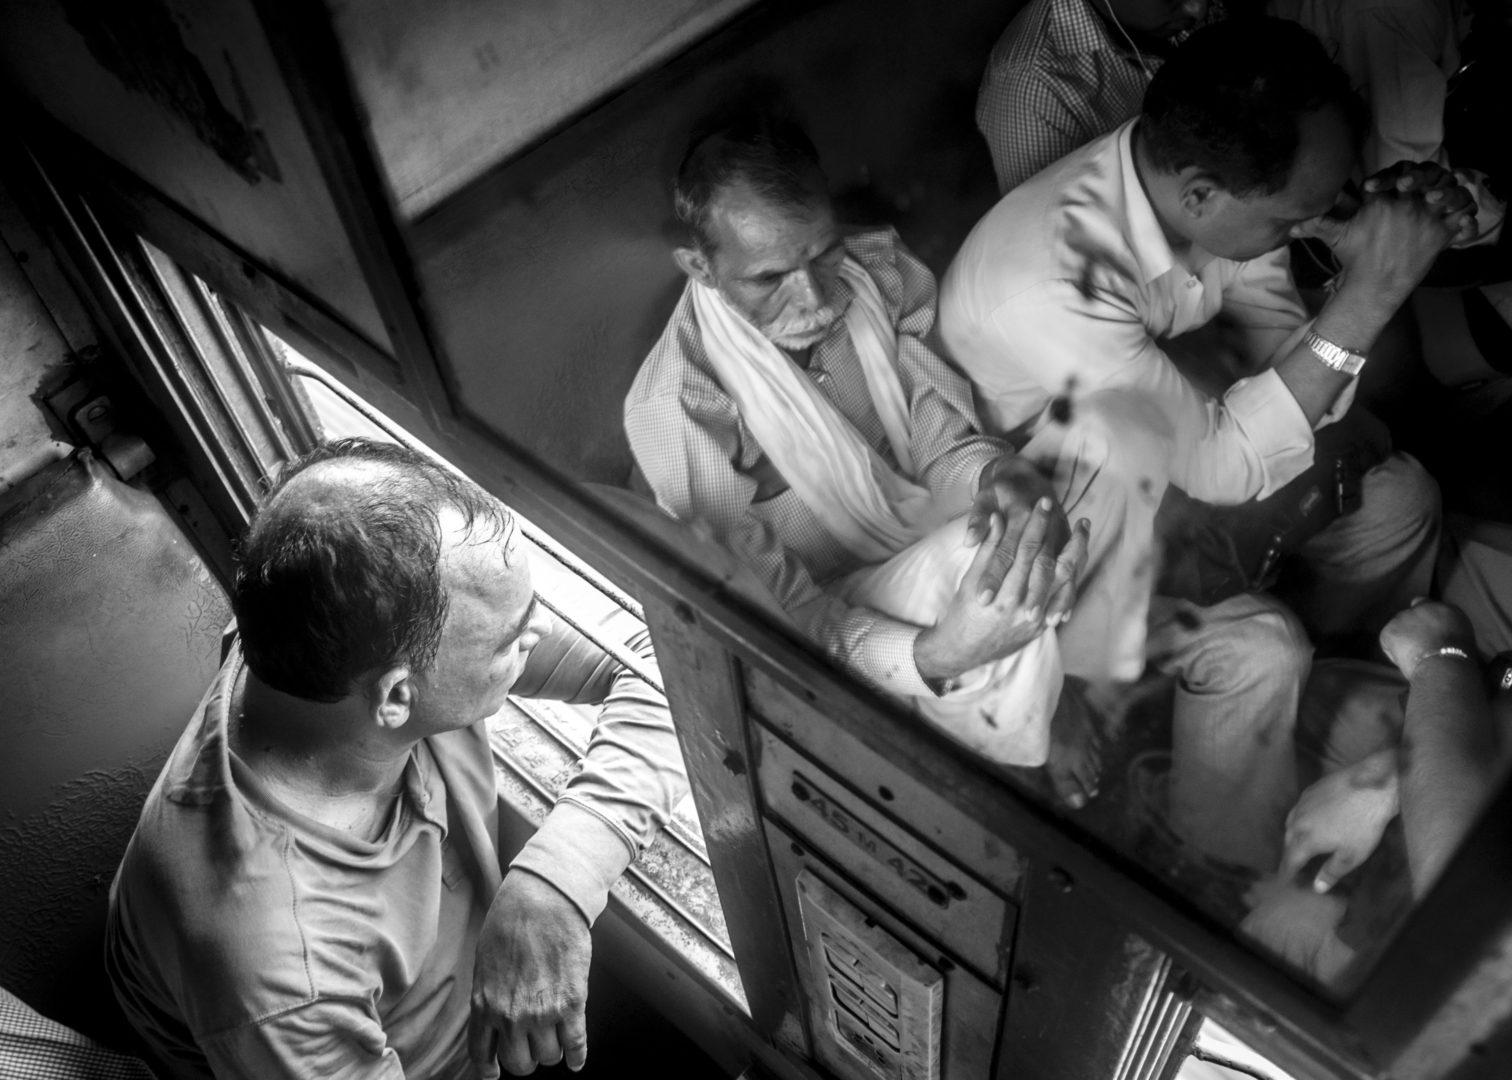 Photographer: Pawan Yadav